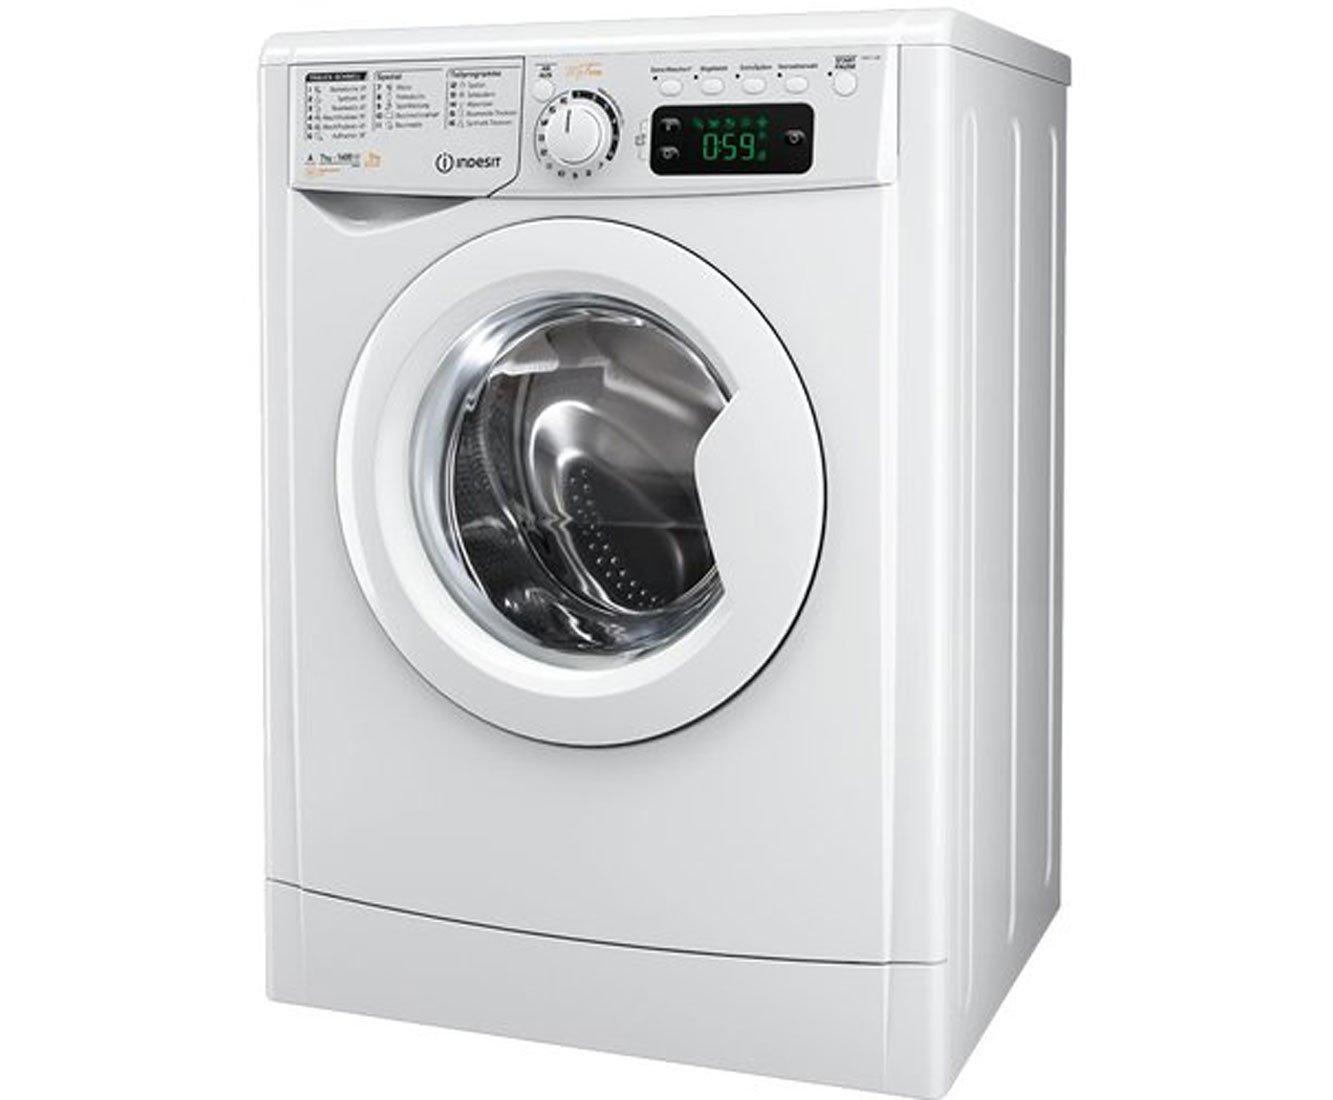 Indesit - Ewde 71280 w de blanca lavadora-secadora, a, 7 kg / 5 kg ...